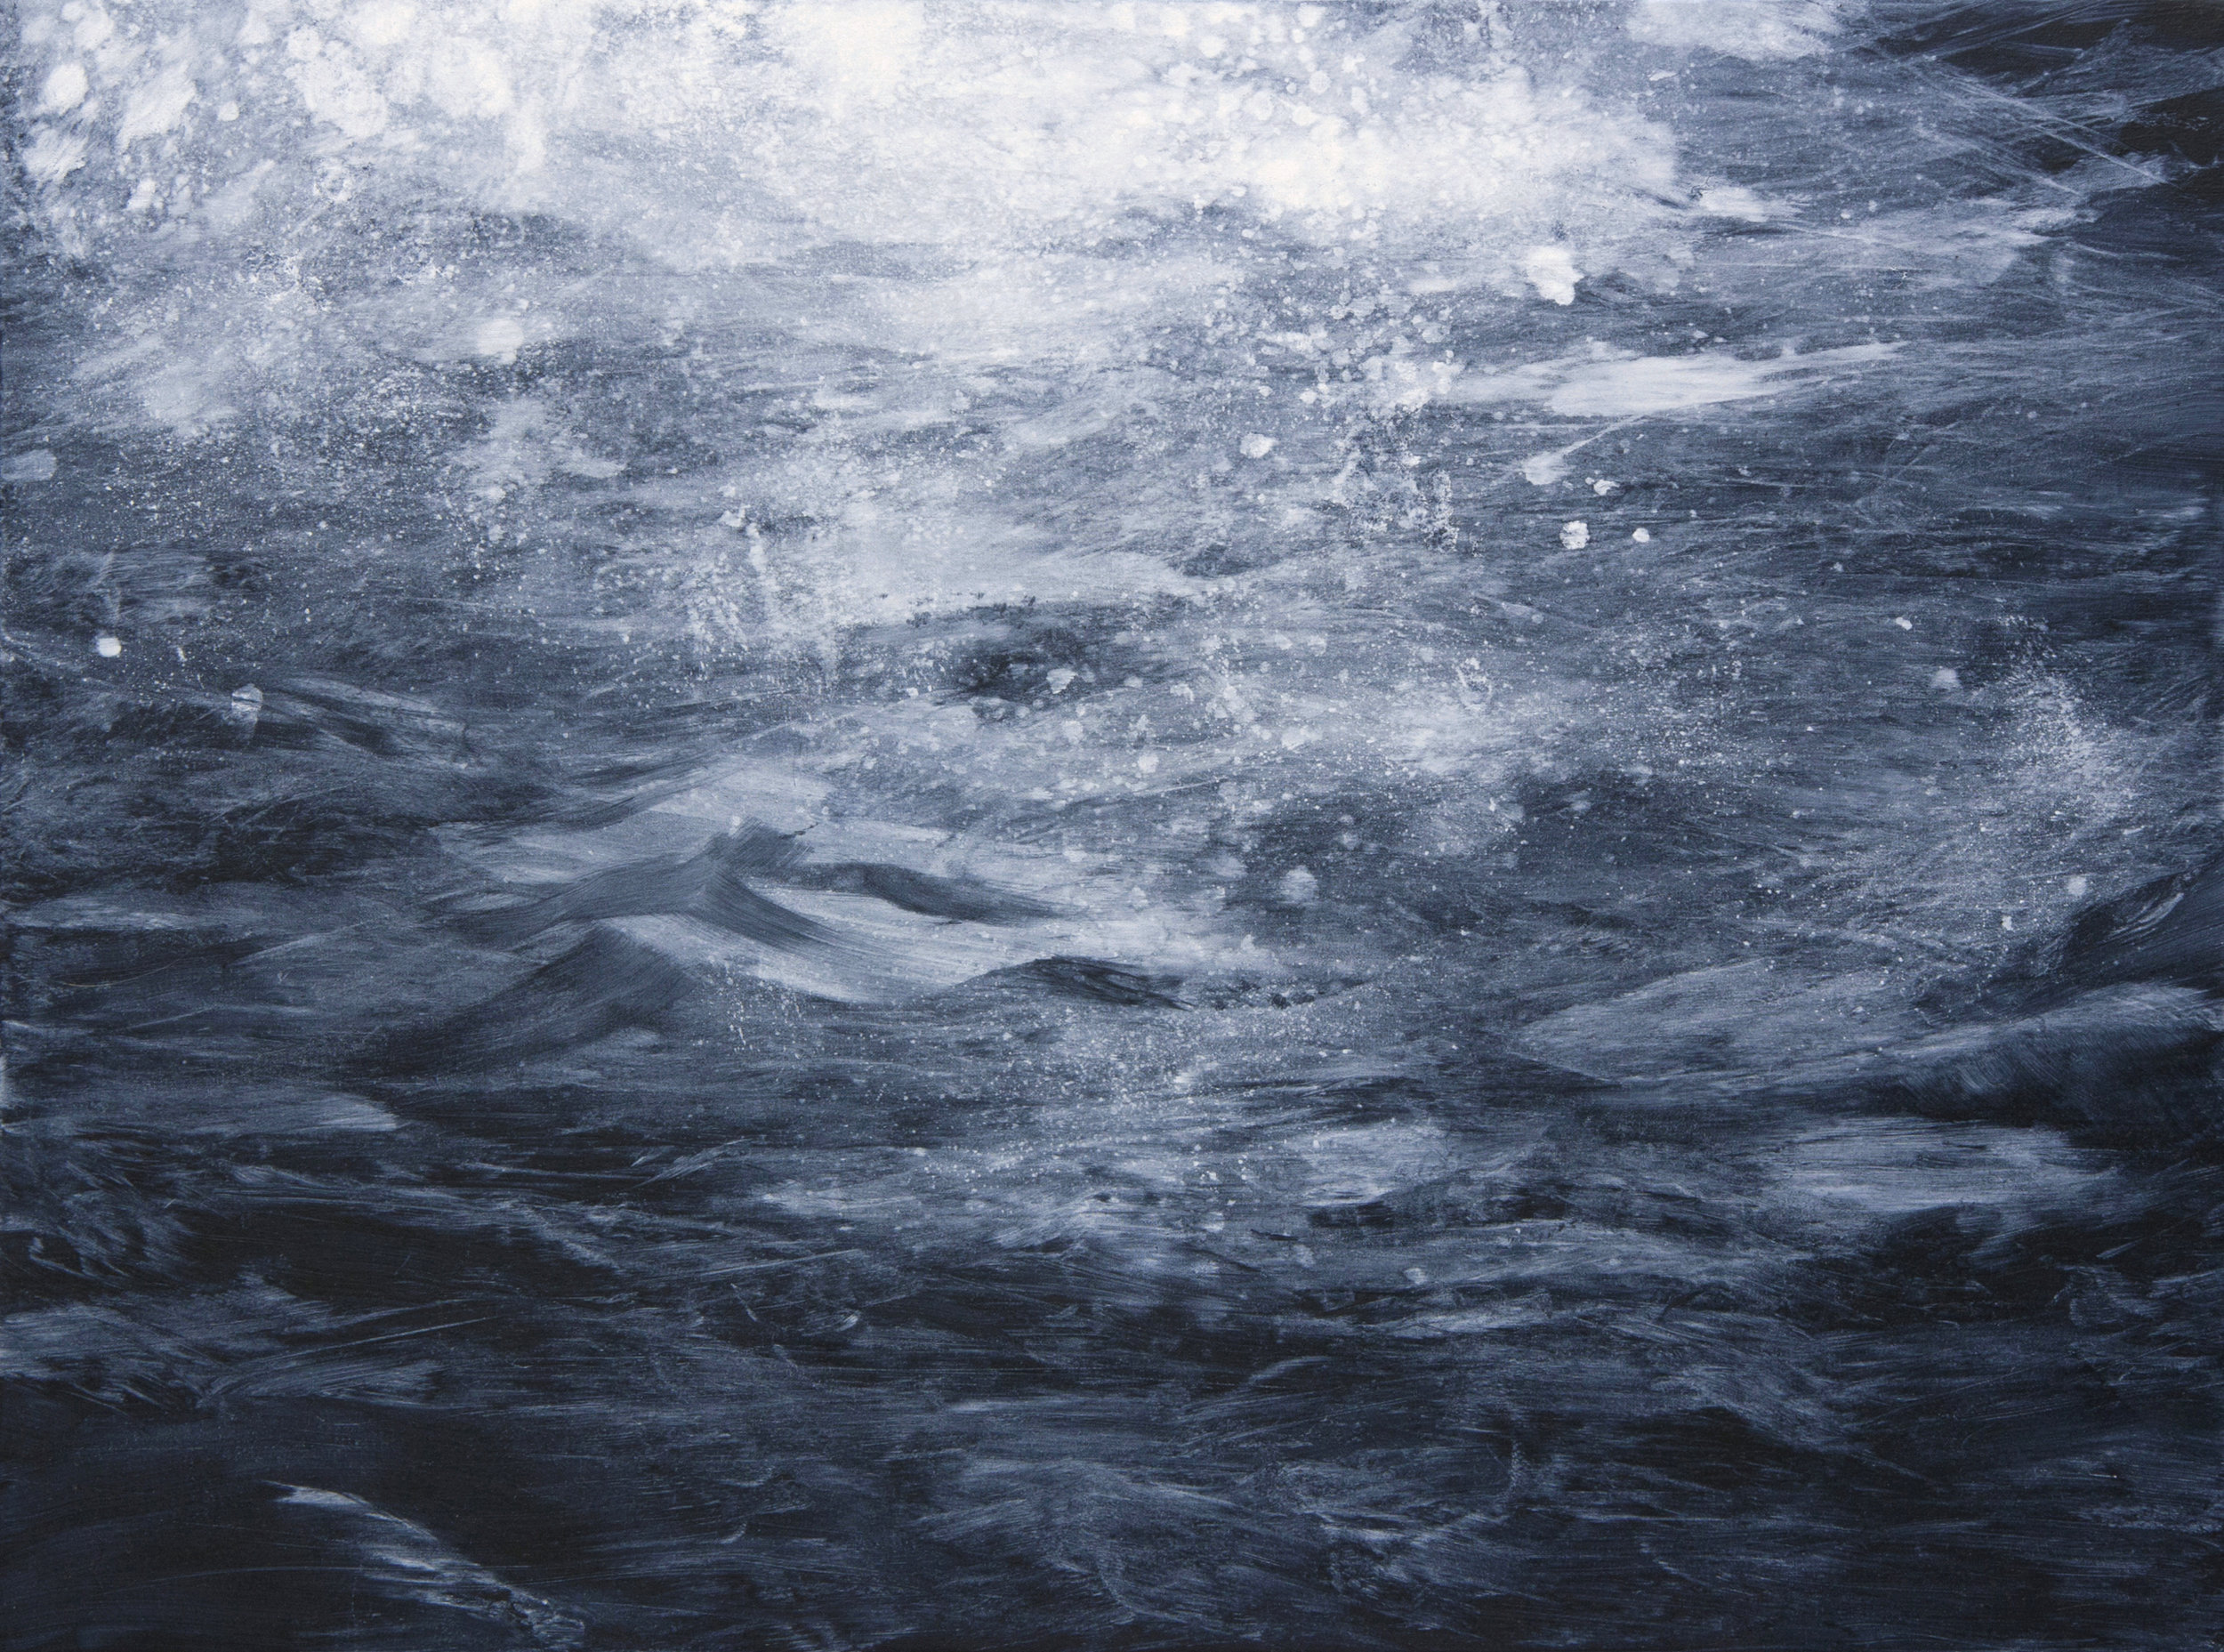 Untitled (Sea I), oil on canvas, 60x80cm, 2015